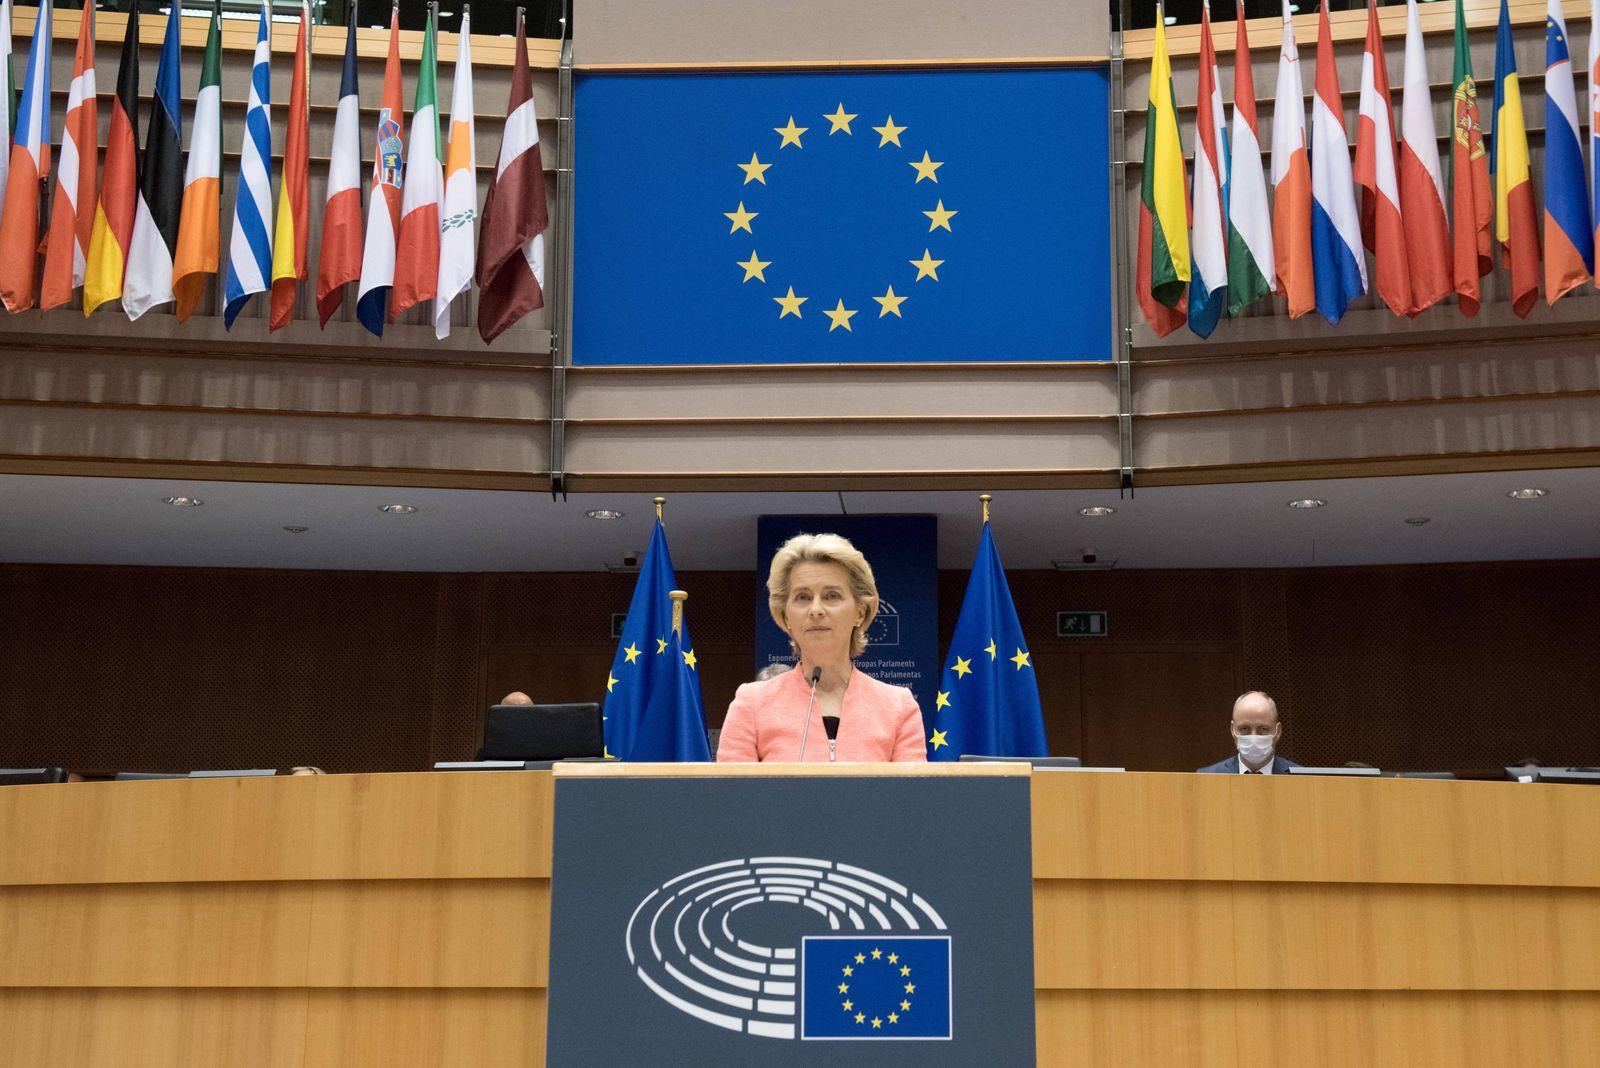 (200916) -- BRUSSELS, Sept. 16, 2020 -- European Commission President Ursula von der Leyen delivers her first State of U